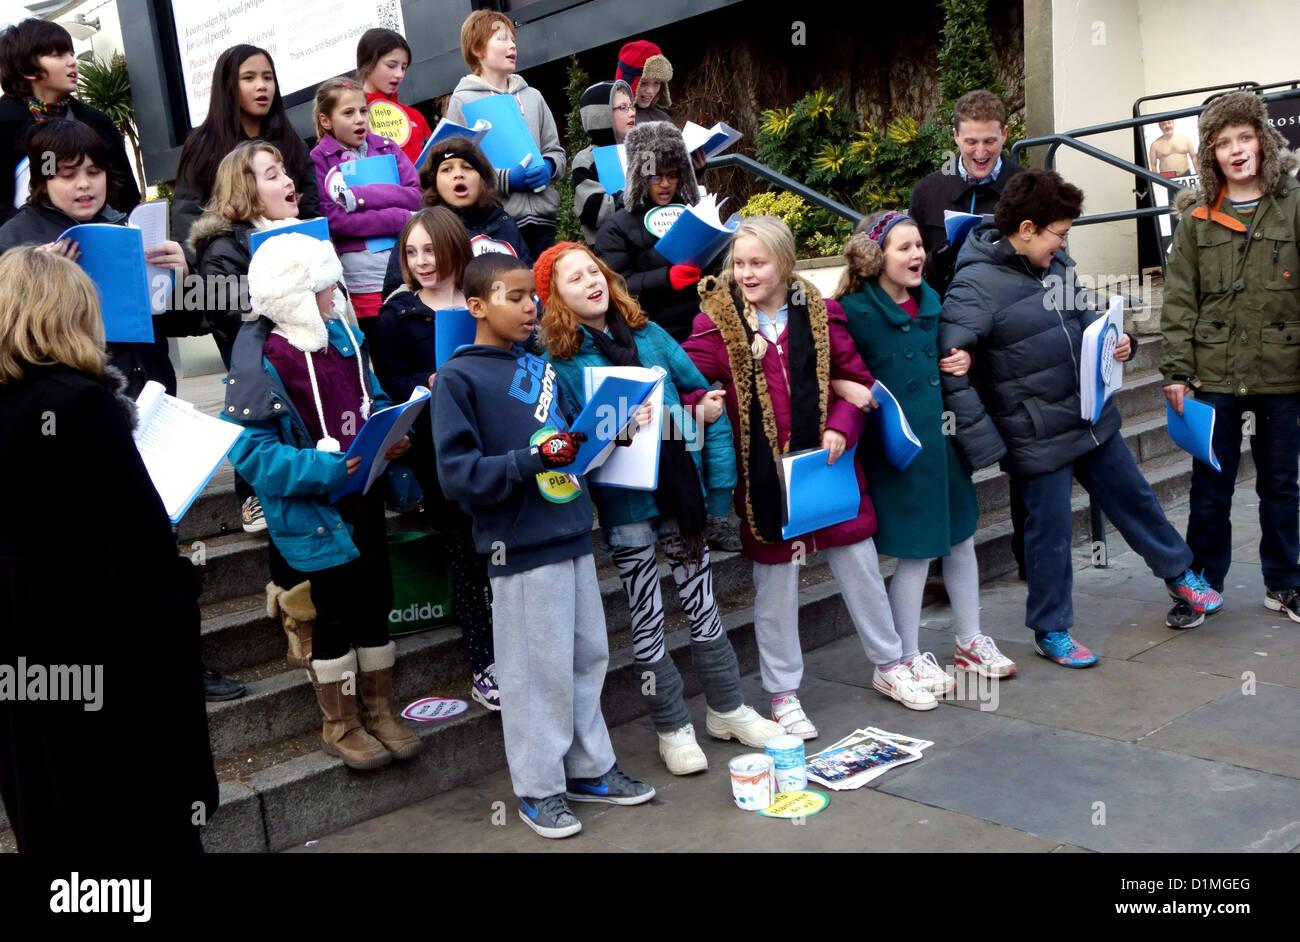 Children's choir sing Christmas carols in London street to raise ...